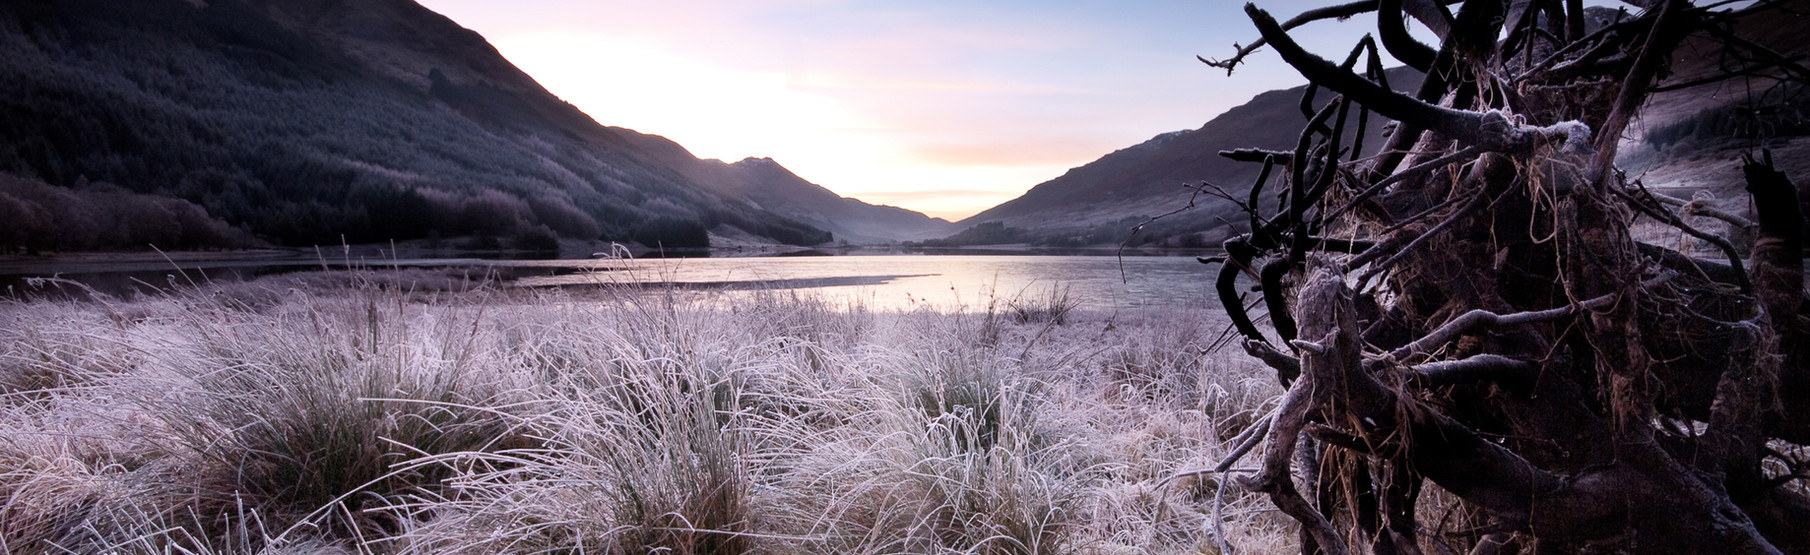 Monachyle Landscape Winter.jpg